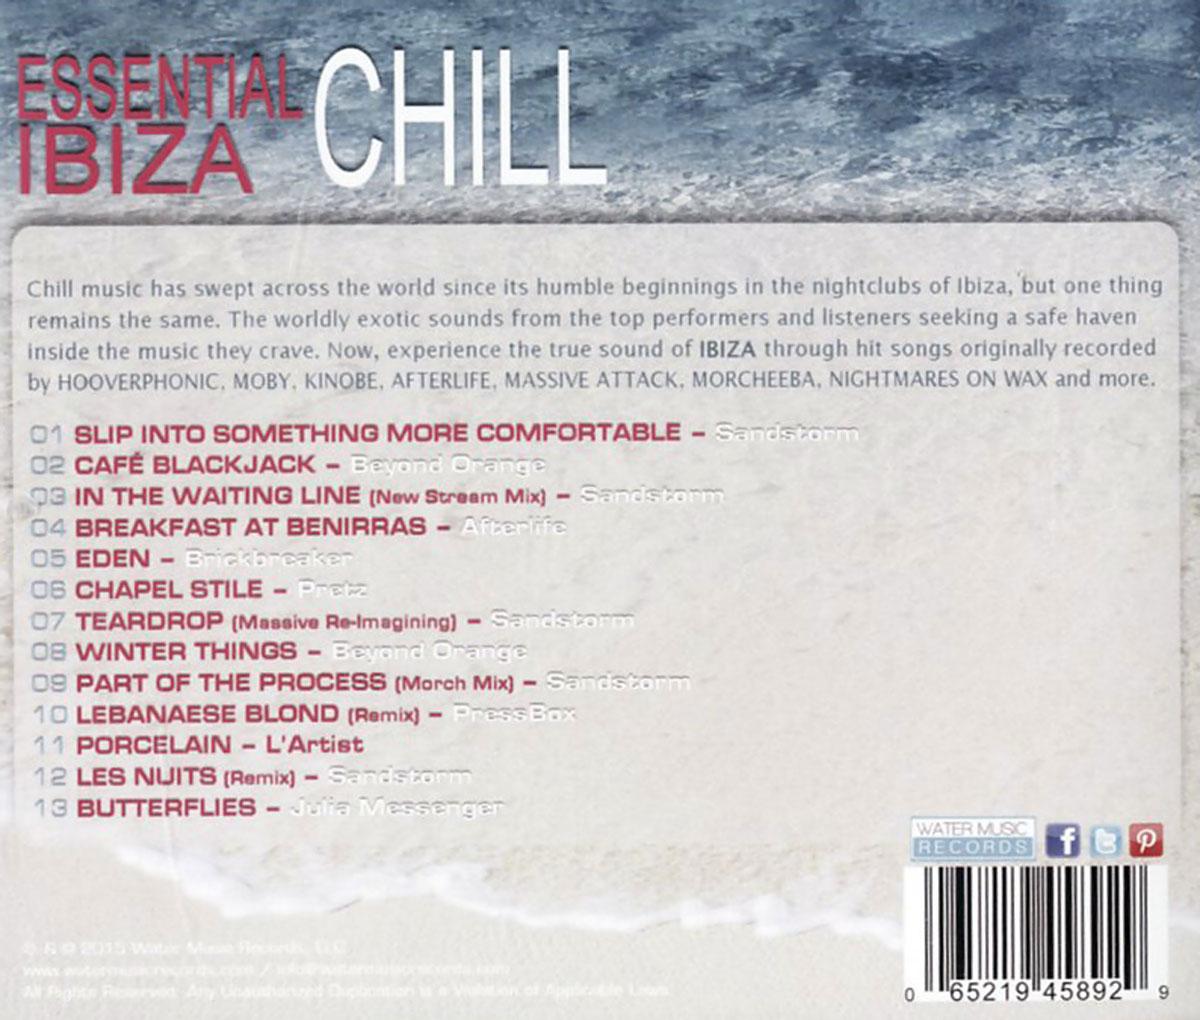 Essential Ibiza Chill Water Music Records, LLC